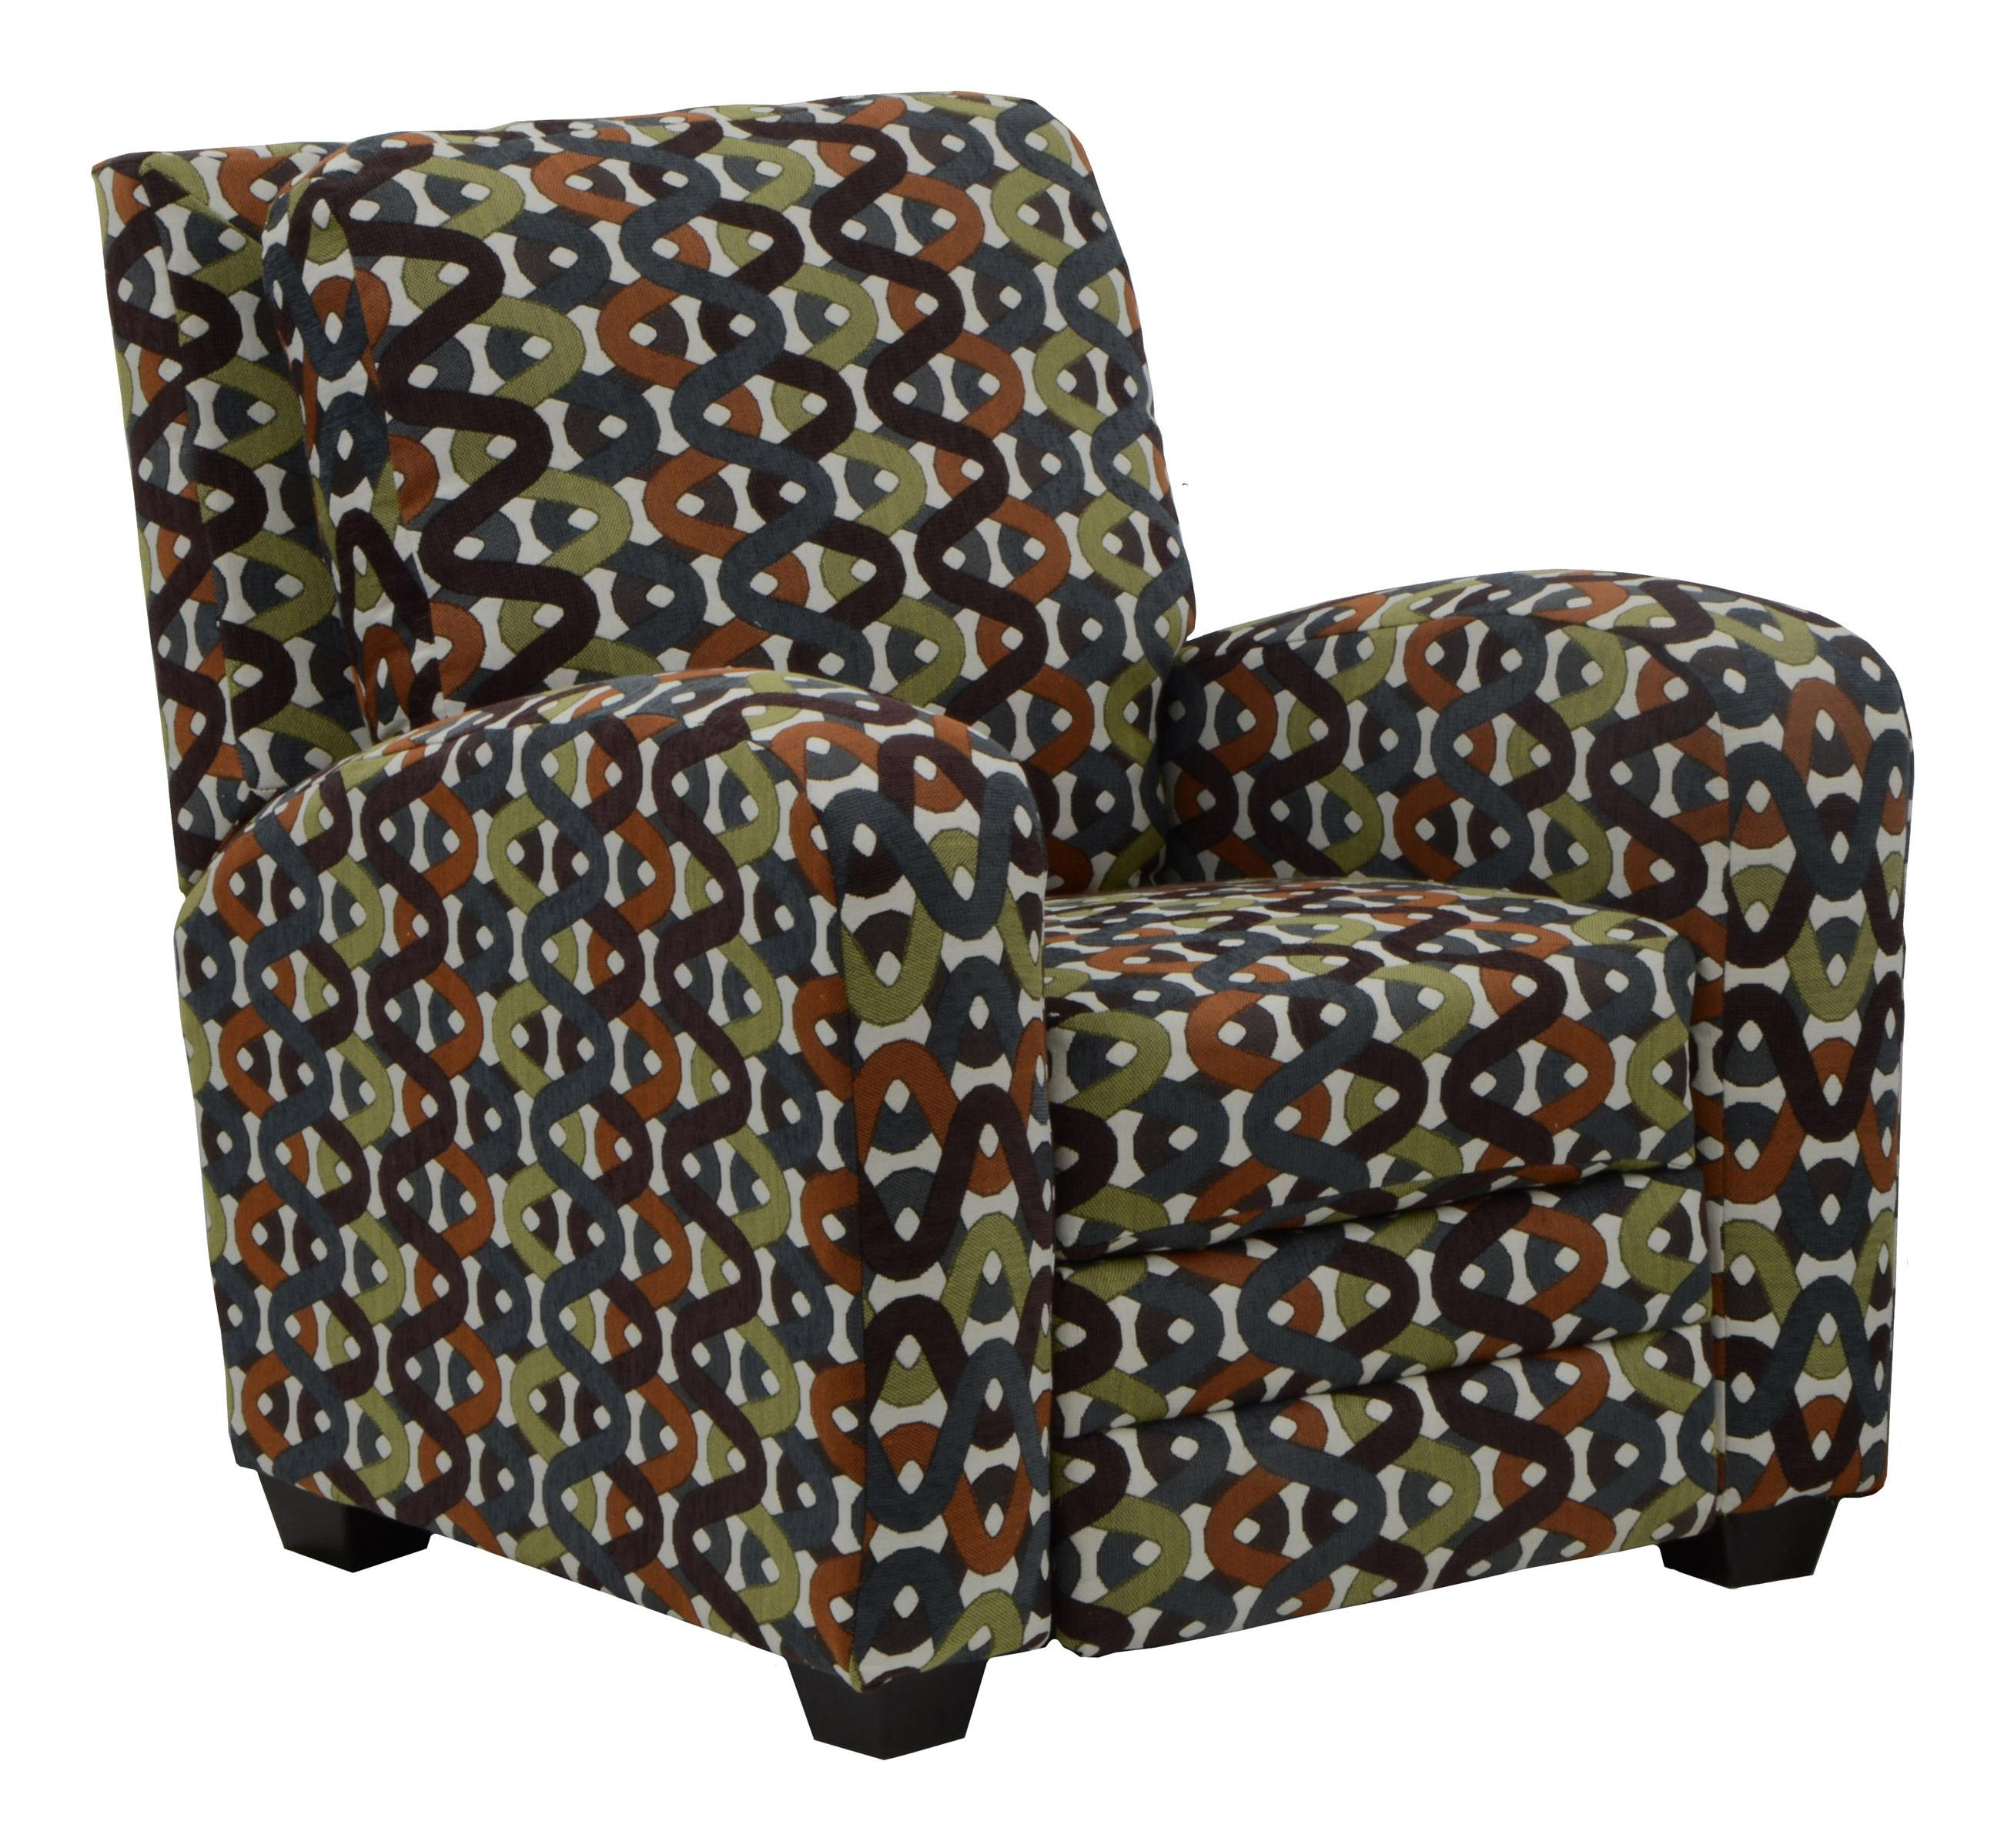 Jackson Furniture Halle Reclining Chair - Item Number: 4381-11-Gemstone